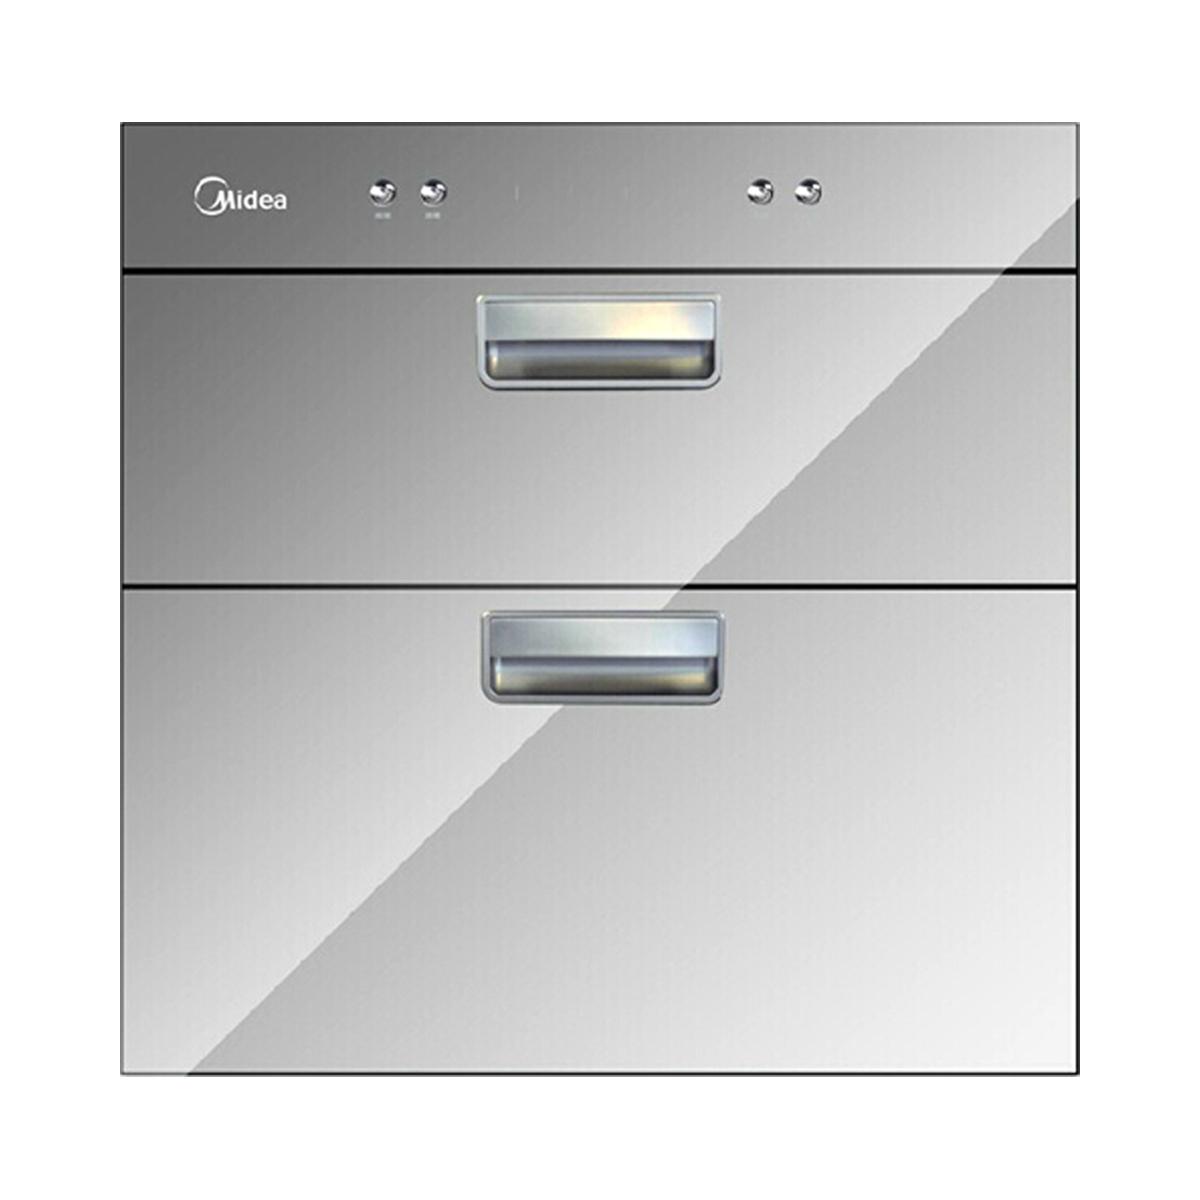 Midea/美的 MXV-ZLP90QD301消毒柜 说明书.pdf